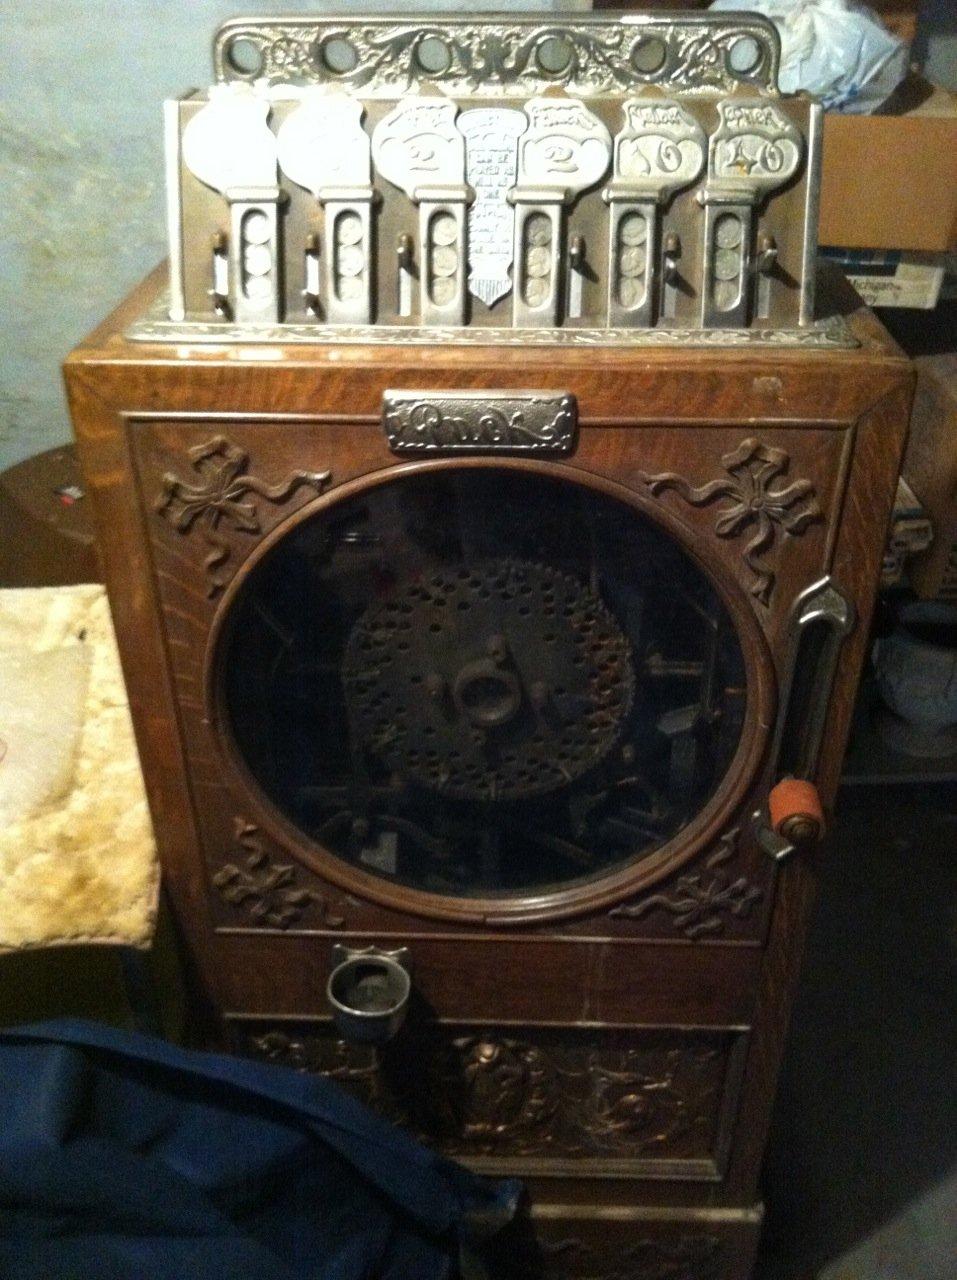 nickel slot machine for sale